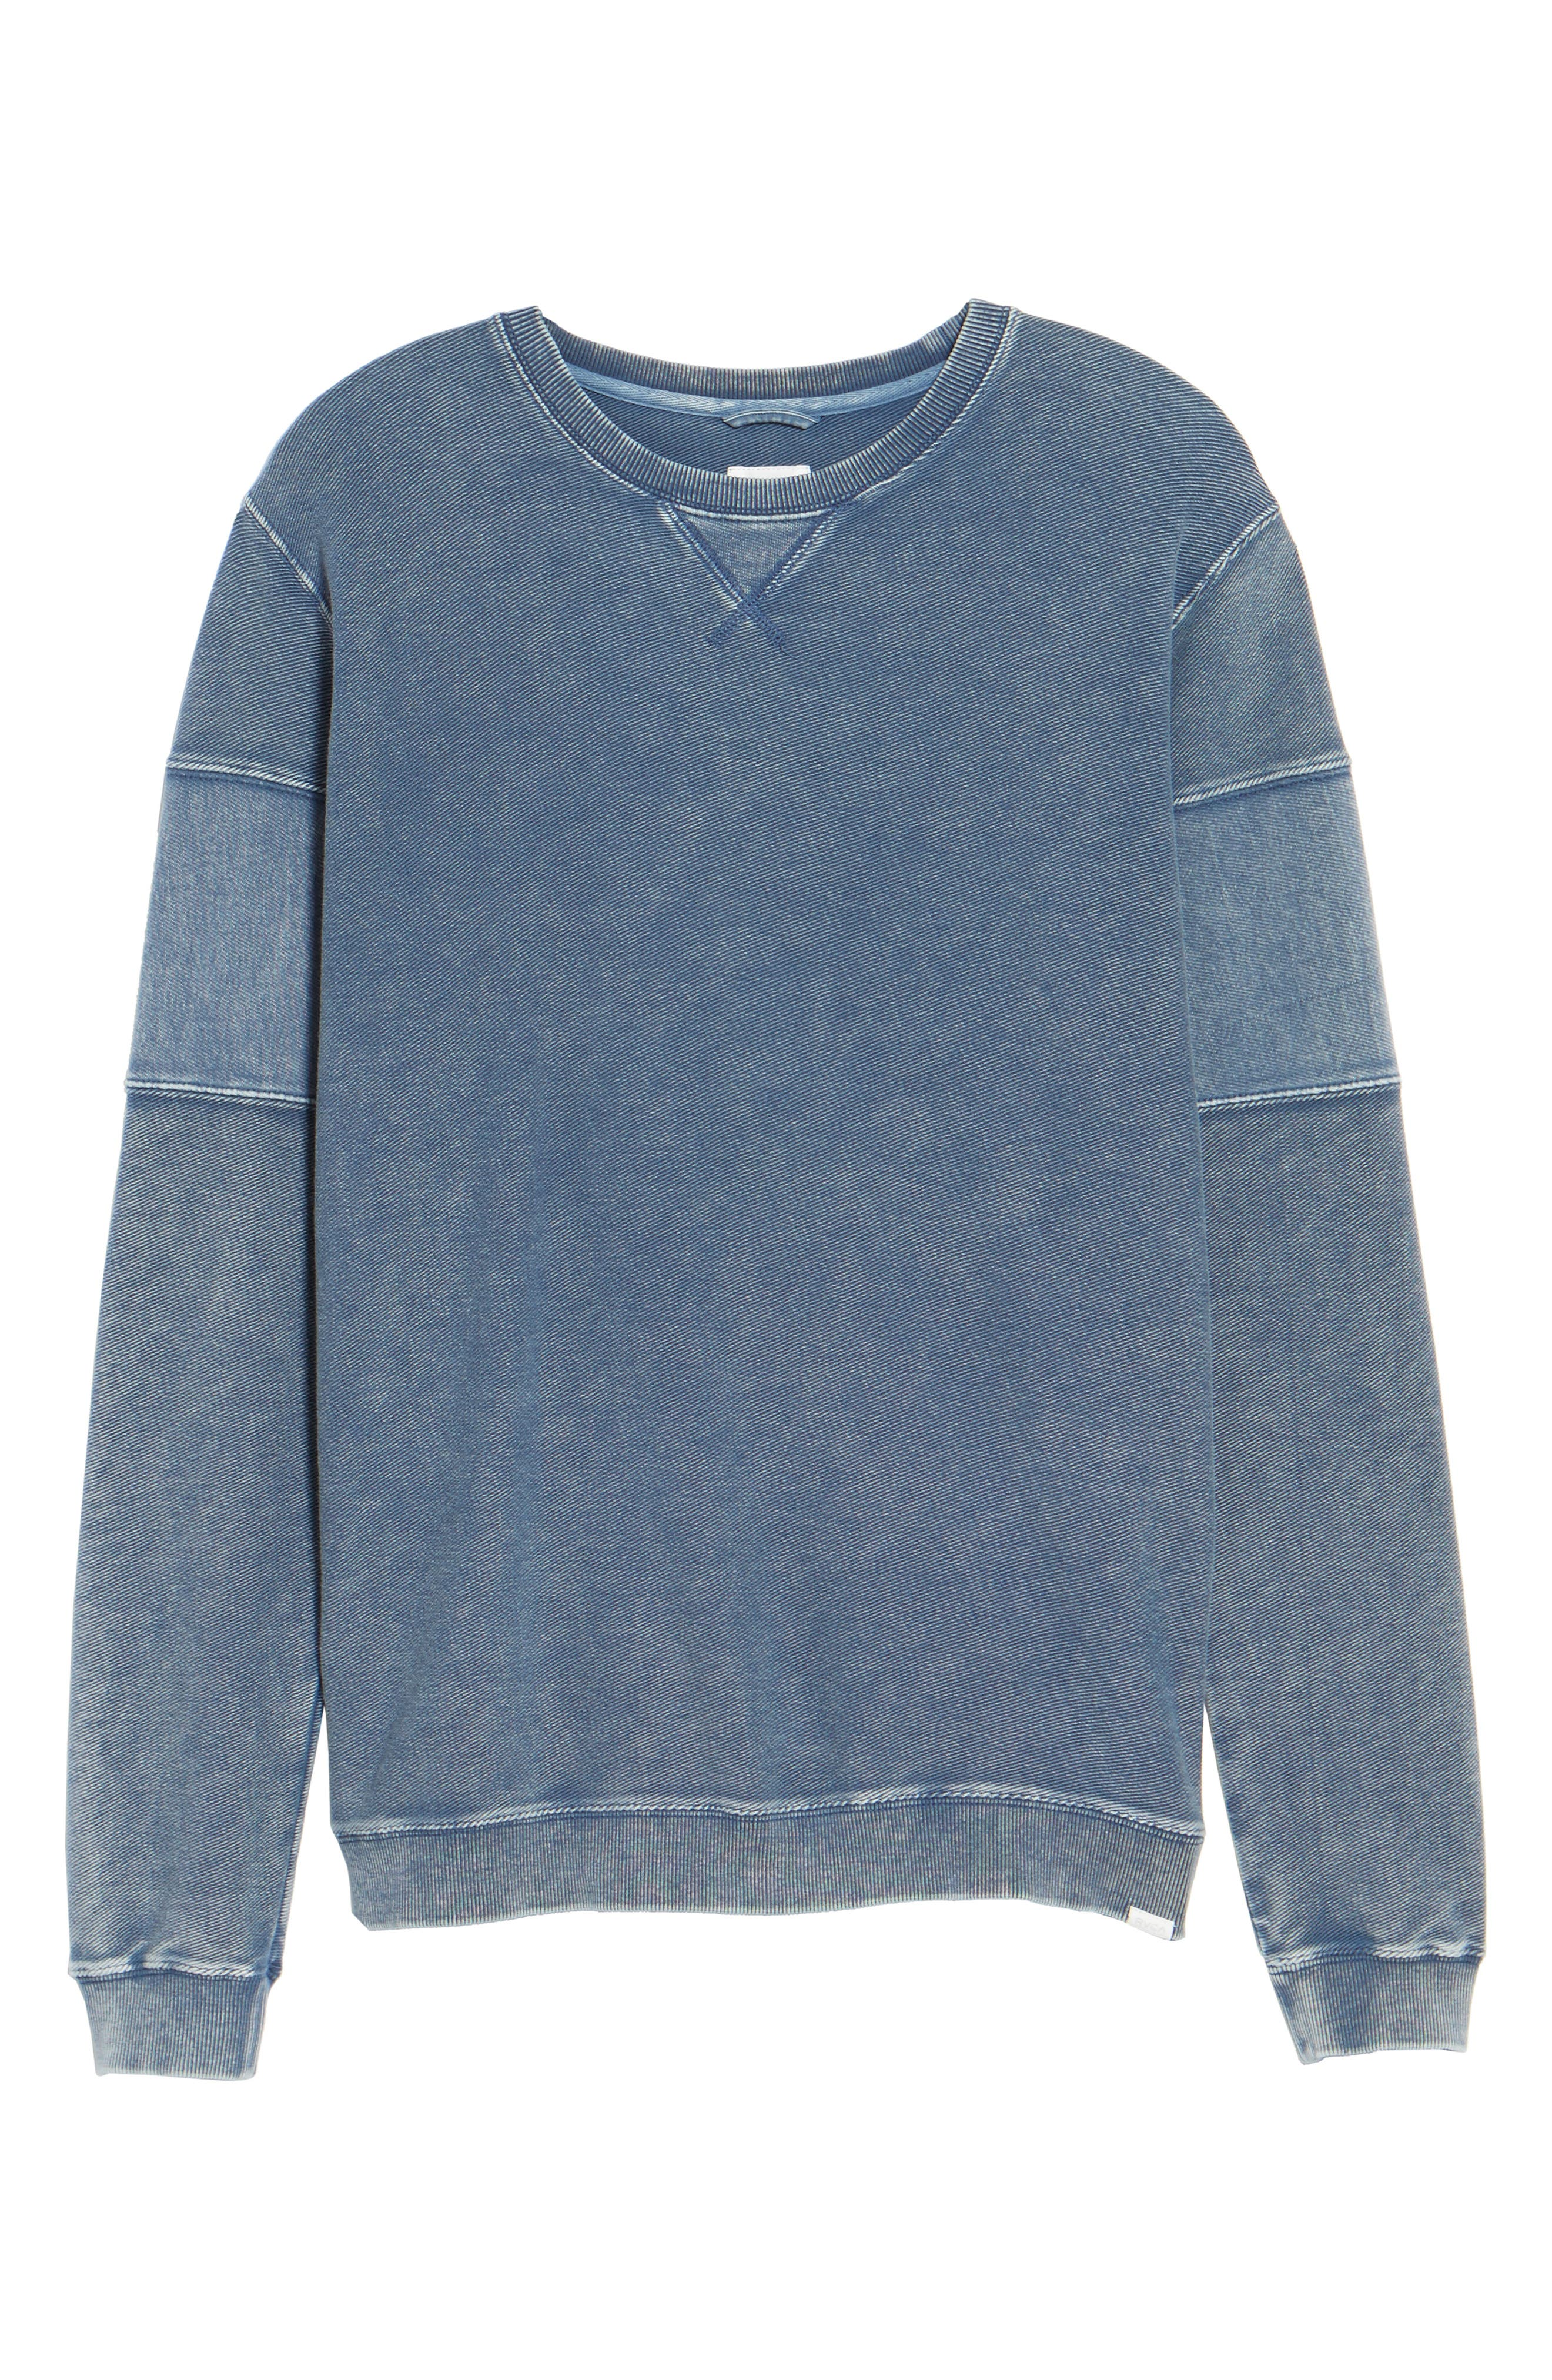 Distressed Sweatshirt,                             Alternate thumbnail 6, color,                             475